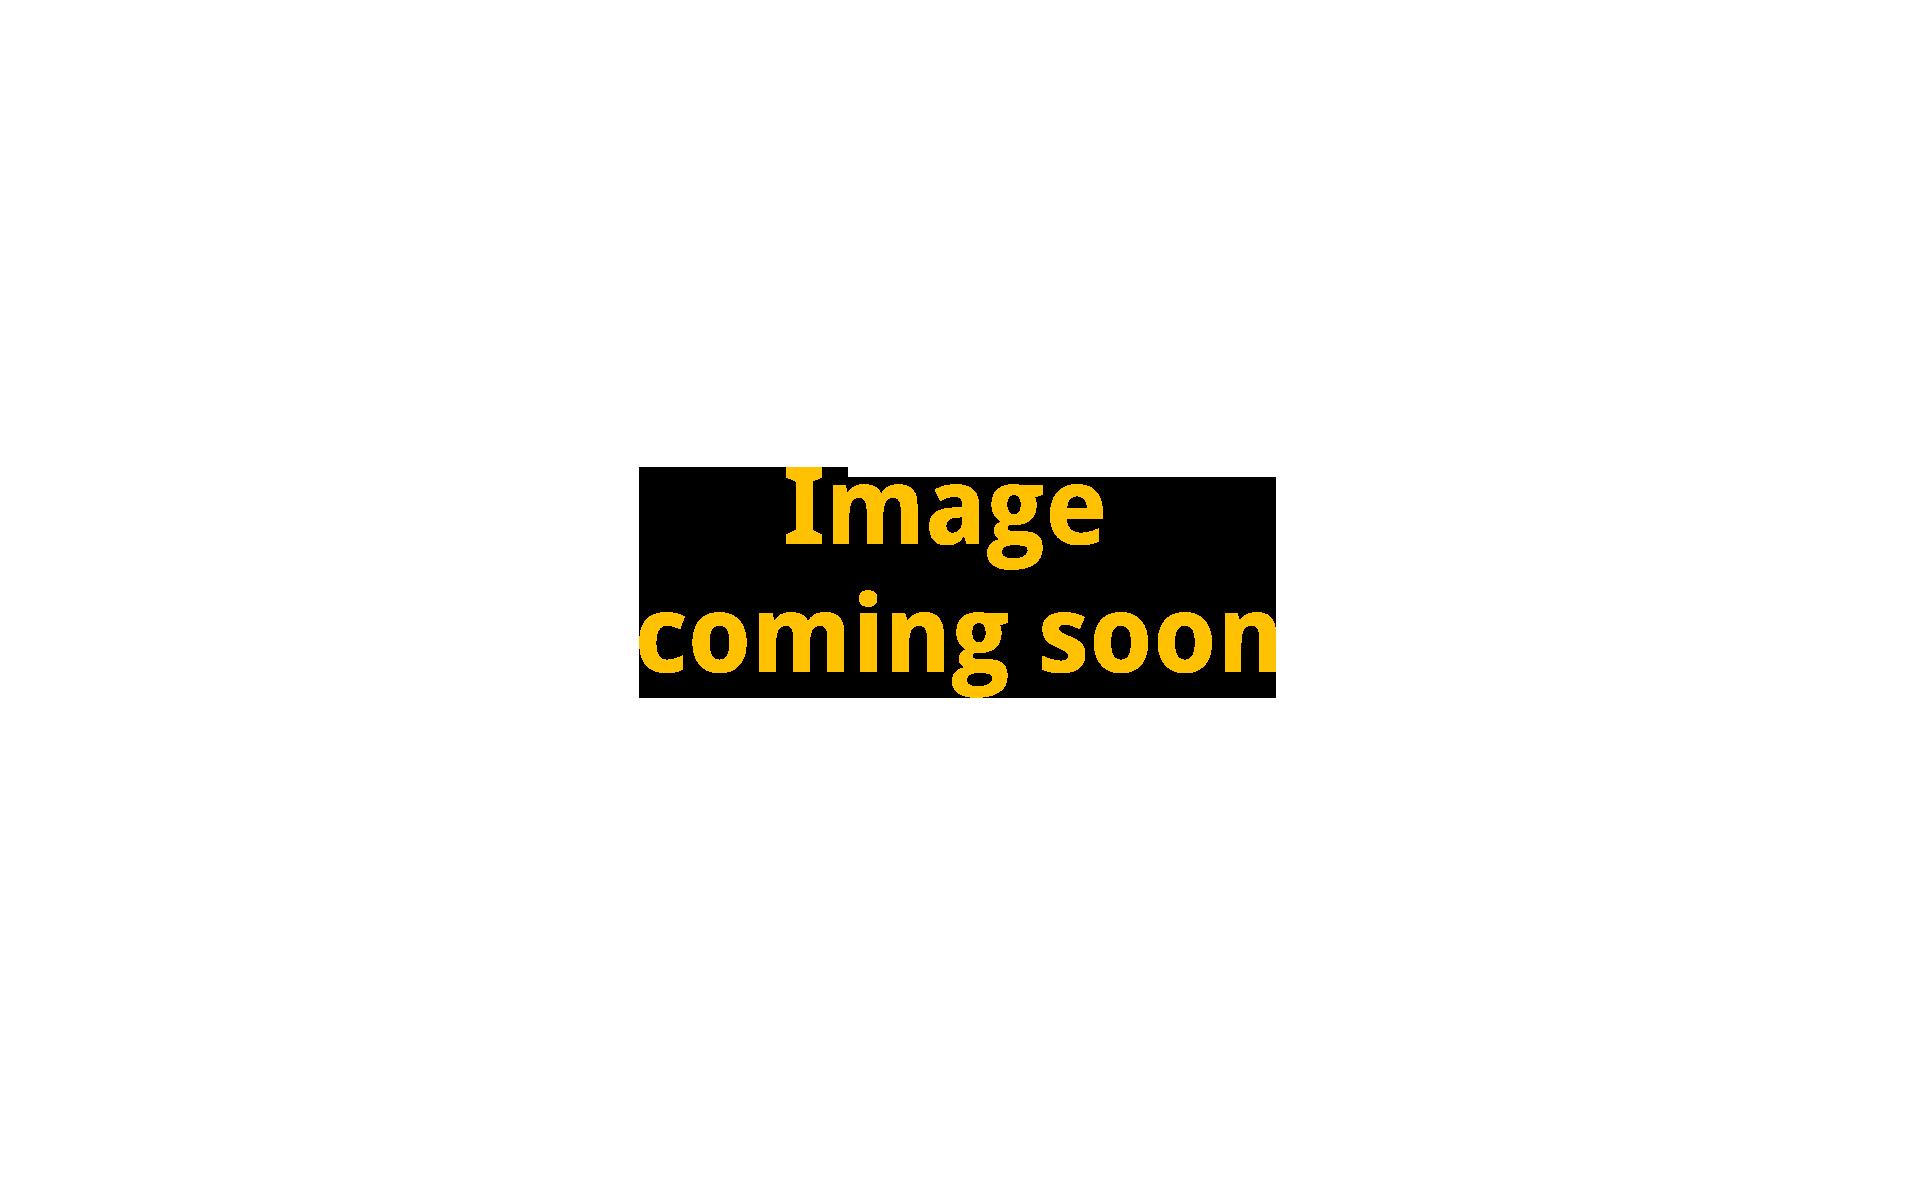 Sleeve #11 PAL Metallic 230mm x 6mm